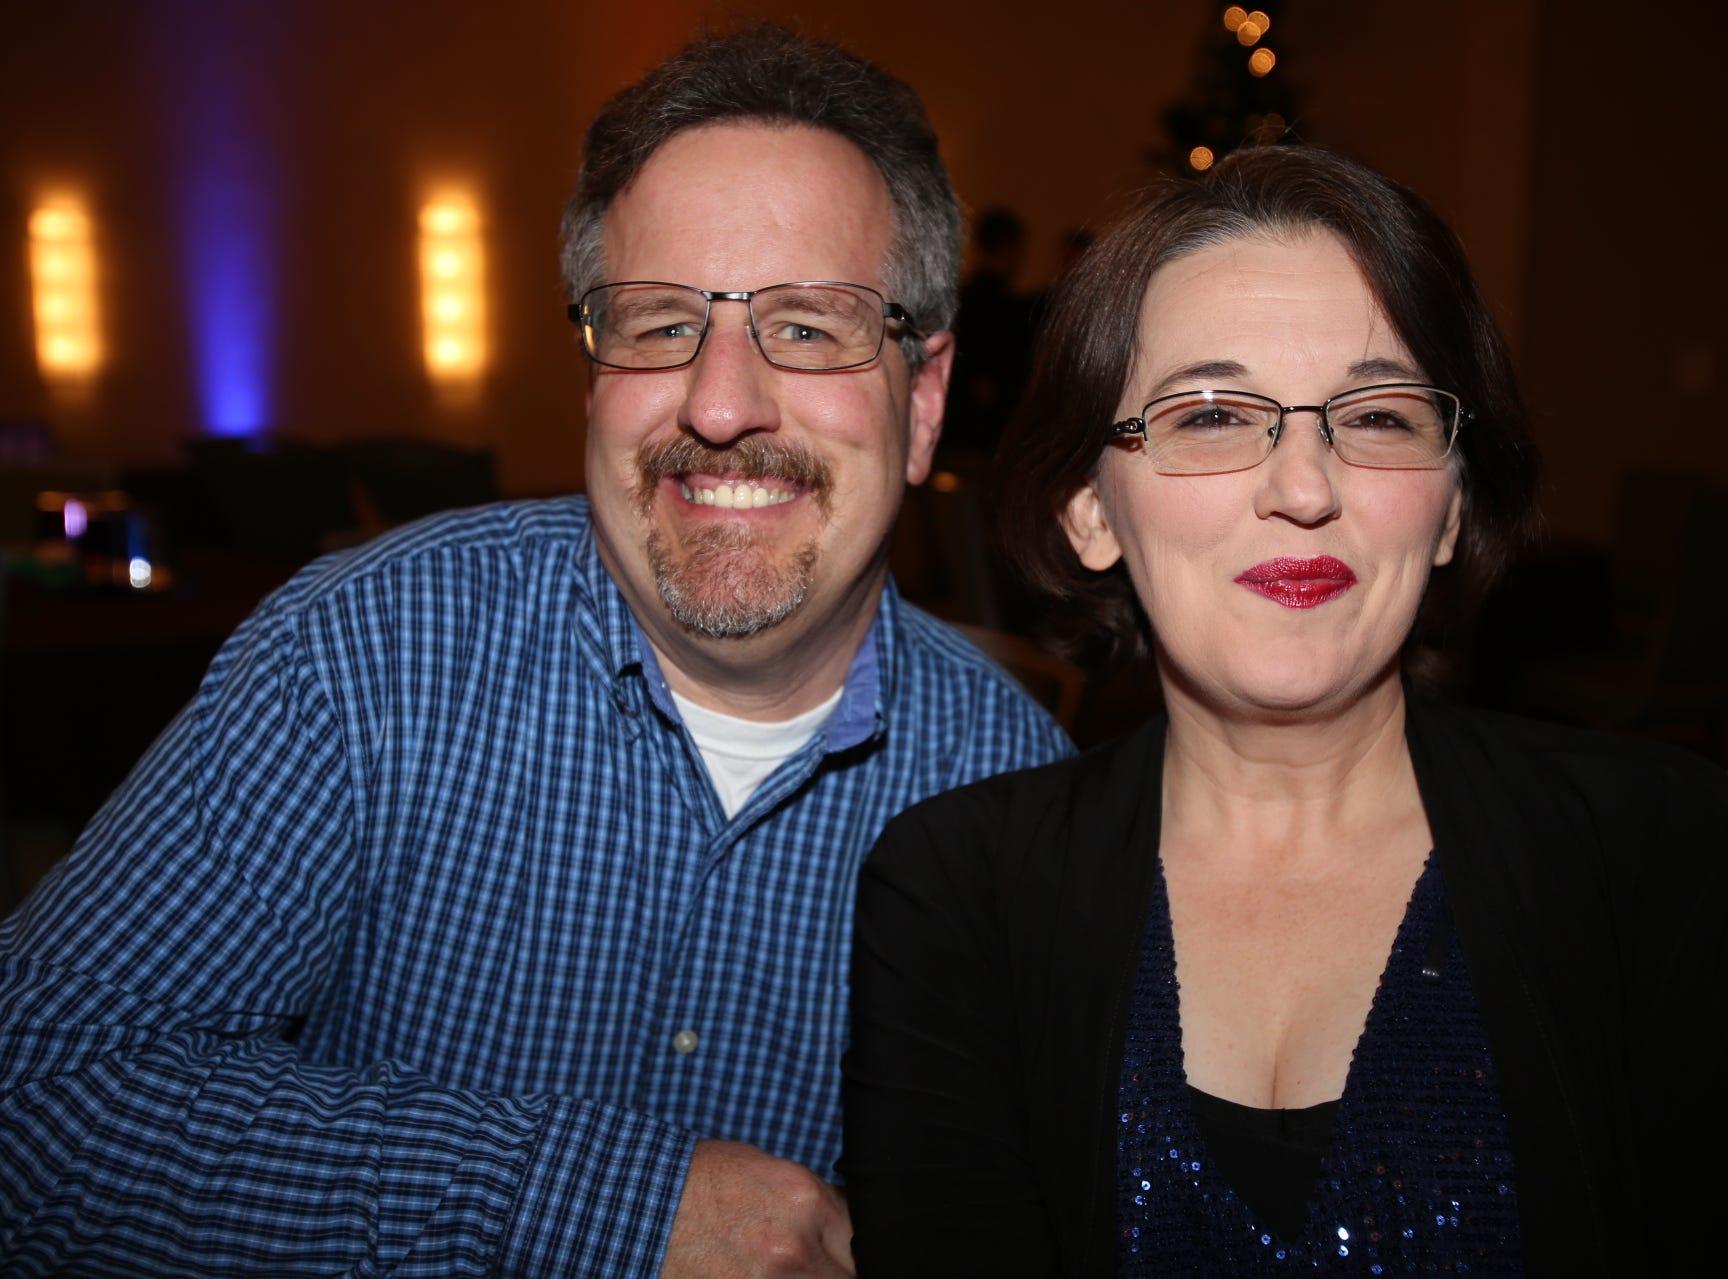 Joseph and Tina Henderson